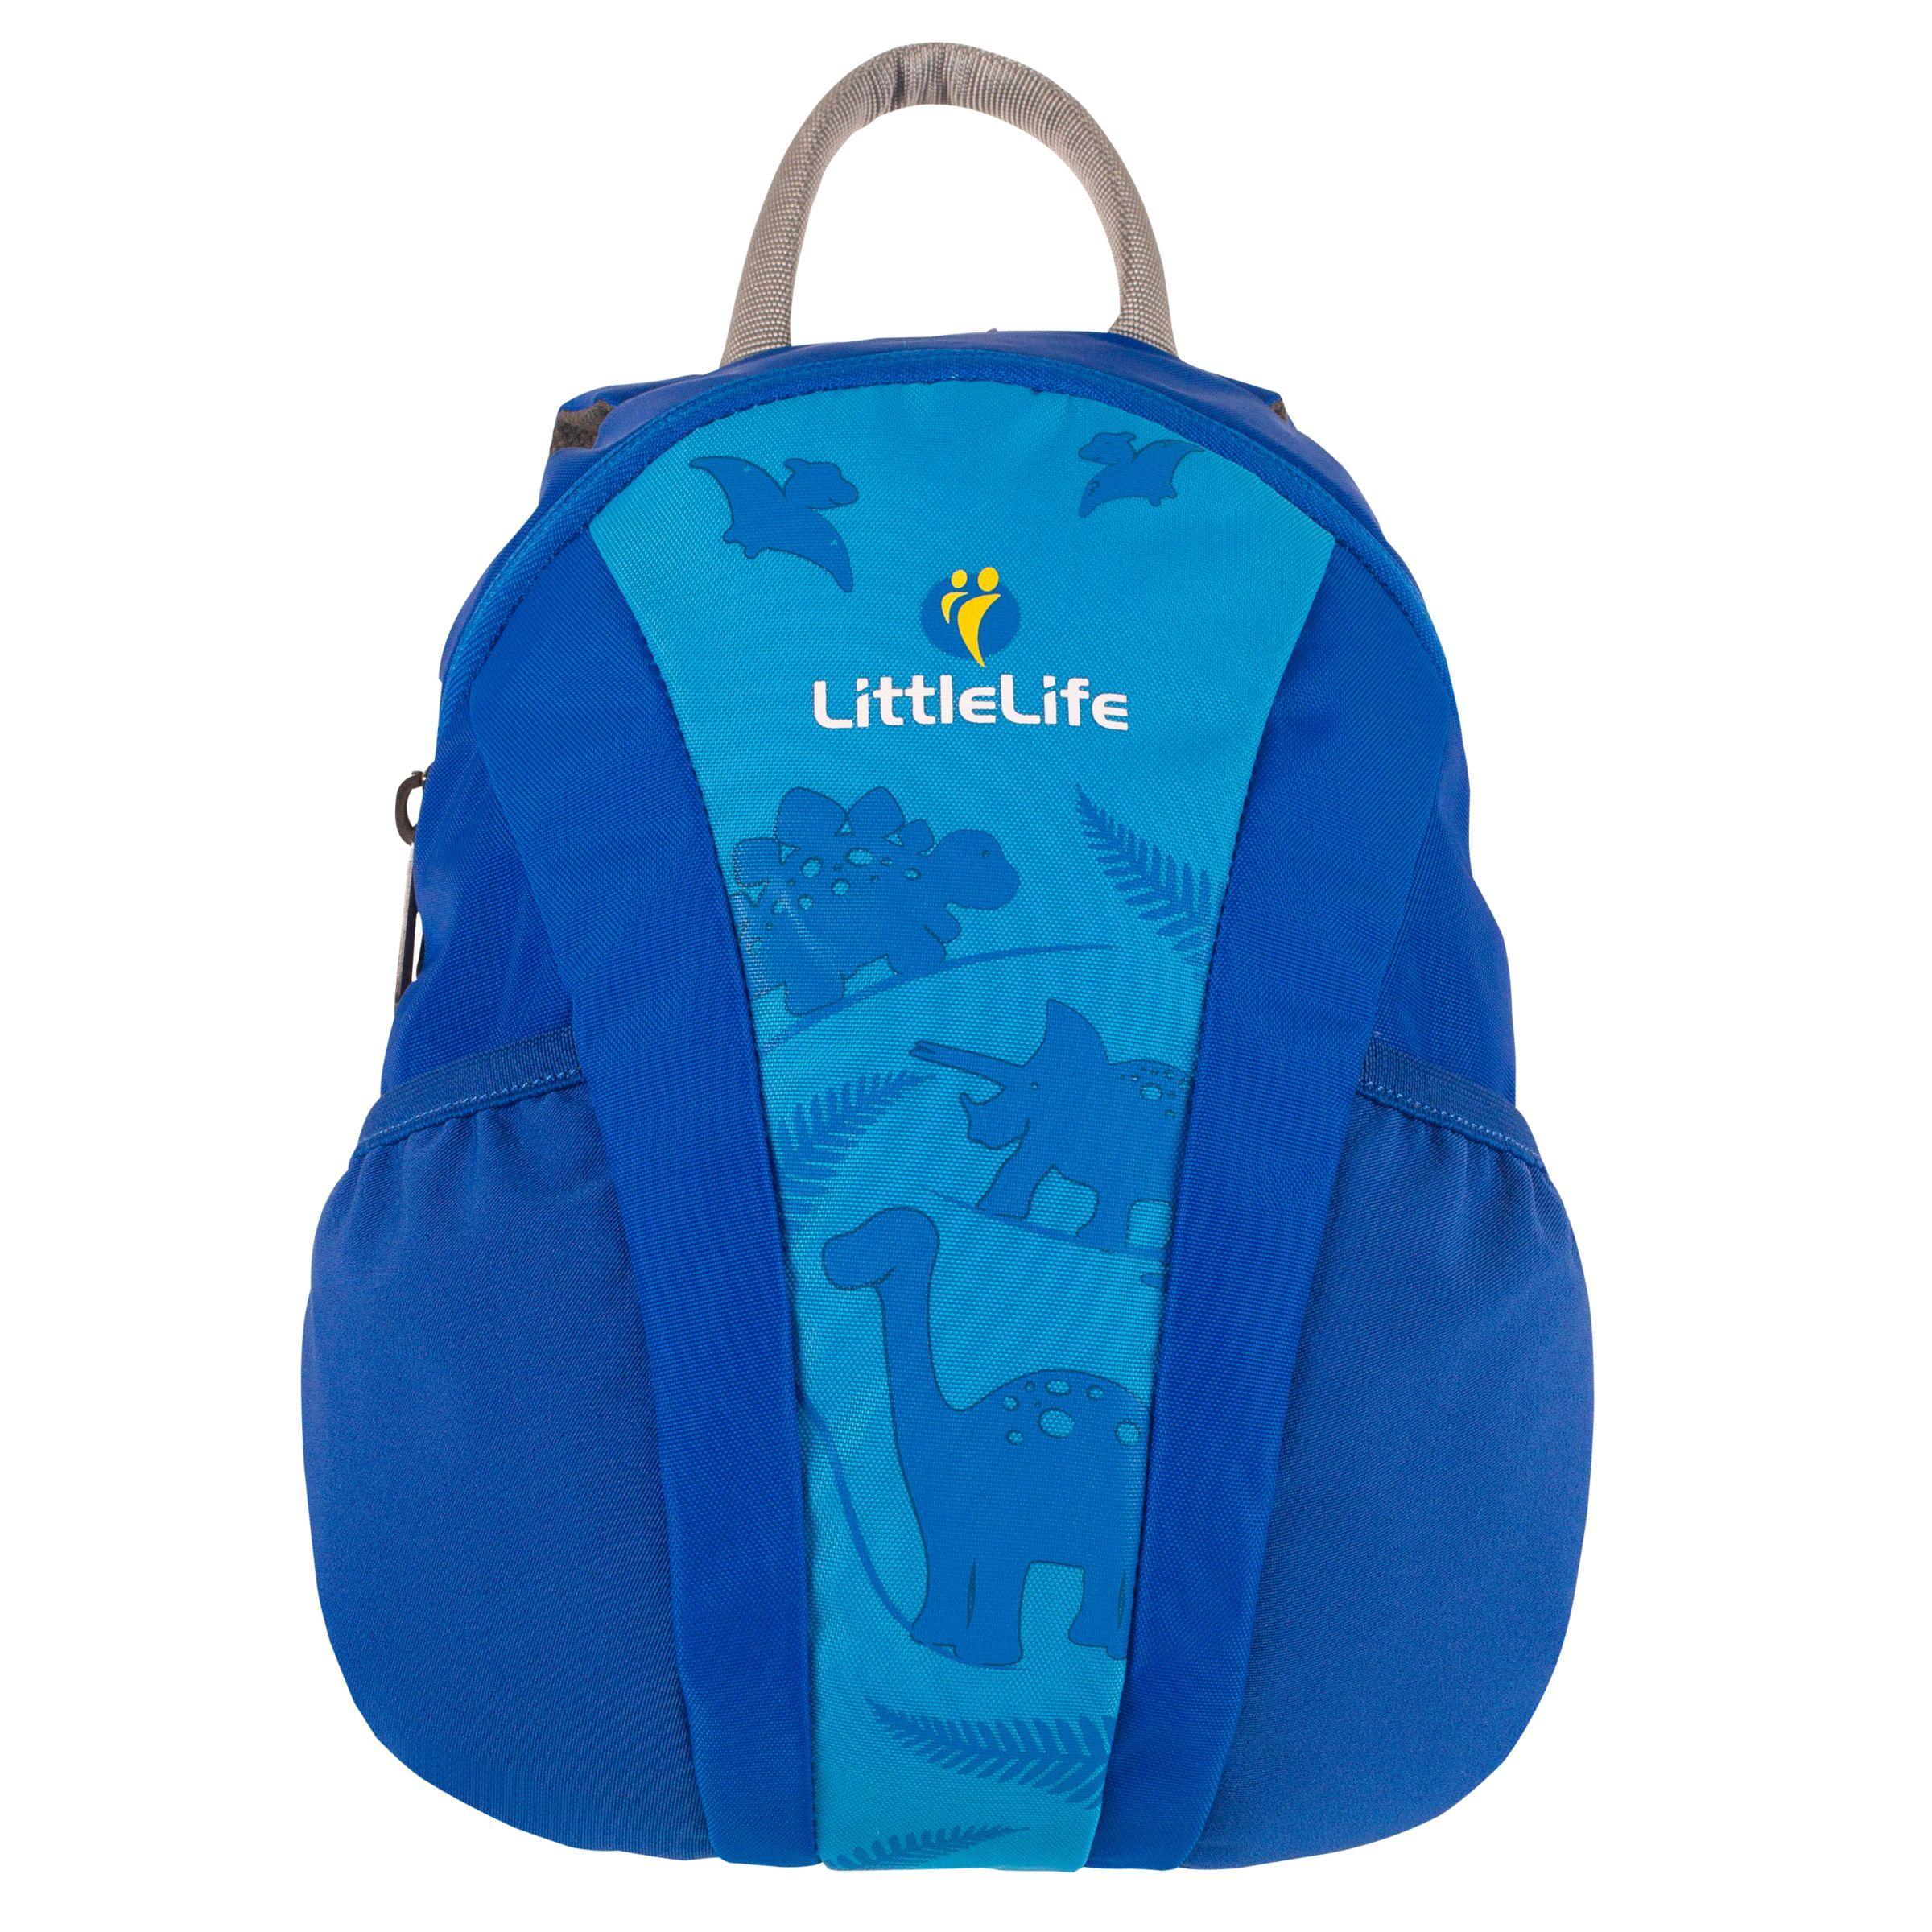 Littlelife LittleLife Toddler Dinosaur Backpack, Blue